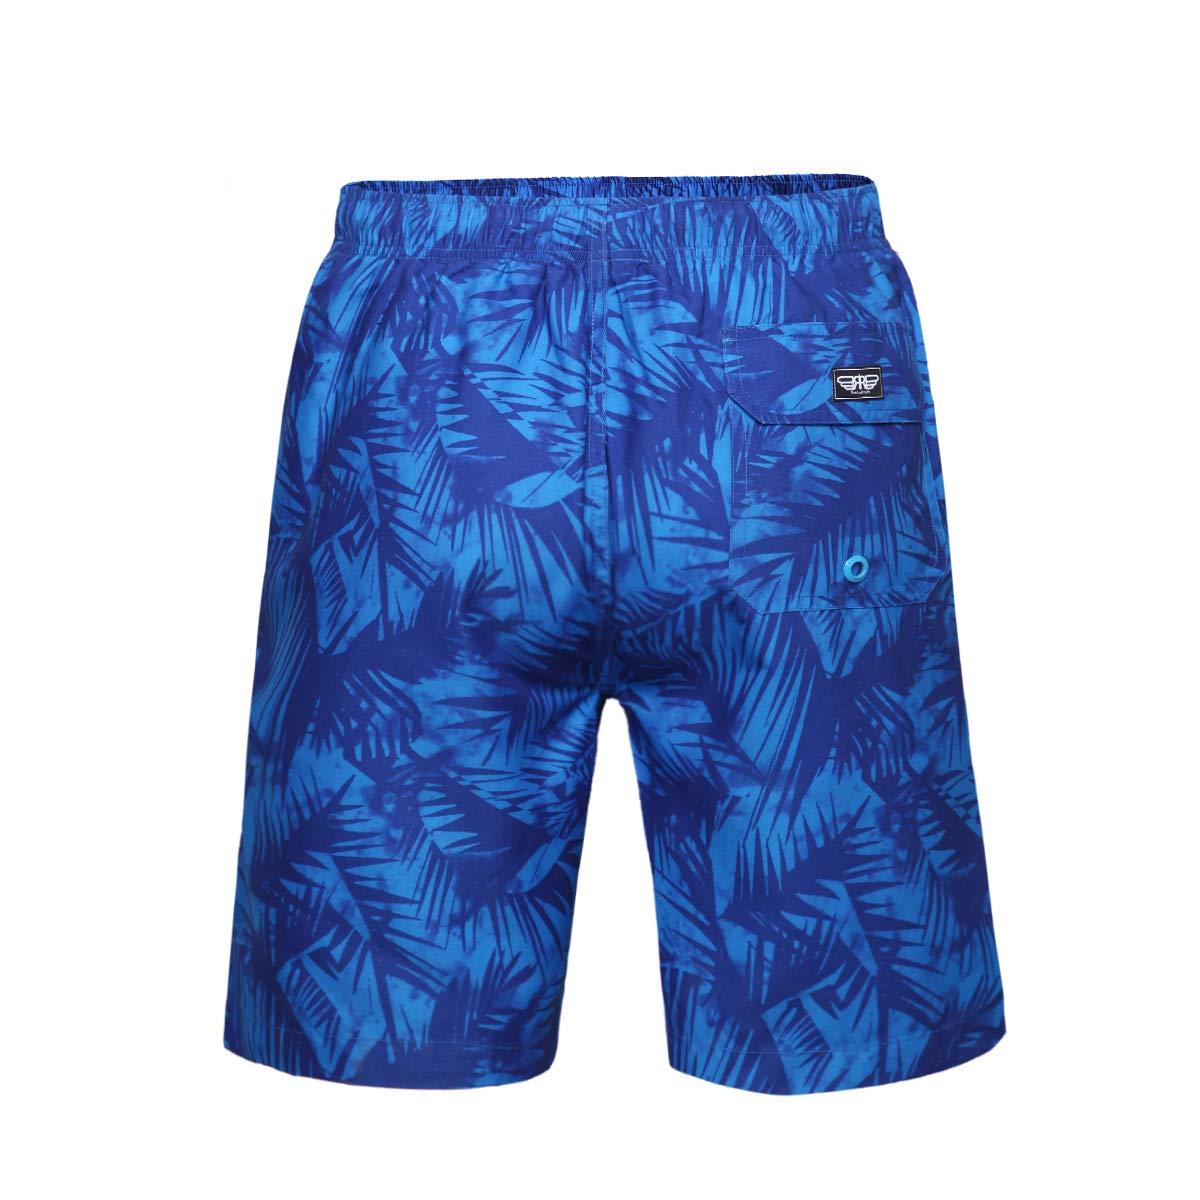 5ac13ba78efa15 Rokka Rolla Men s Quick Dry Drawstring Waist Swim Trunks Board Shorts with  Mesh Lining